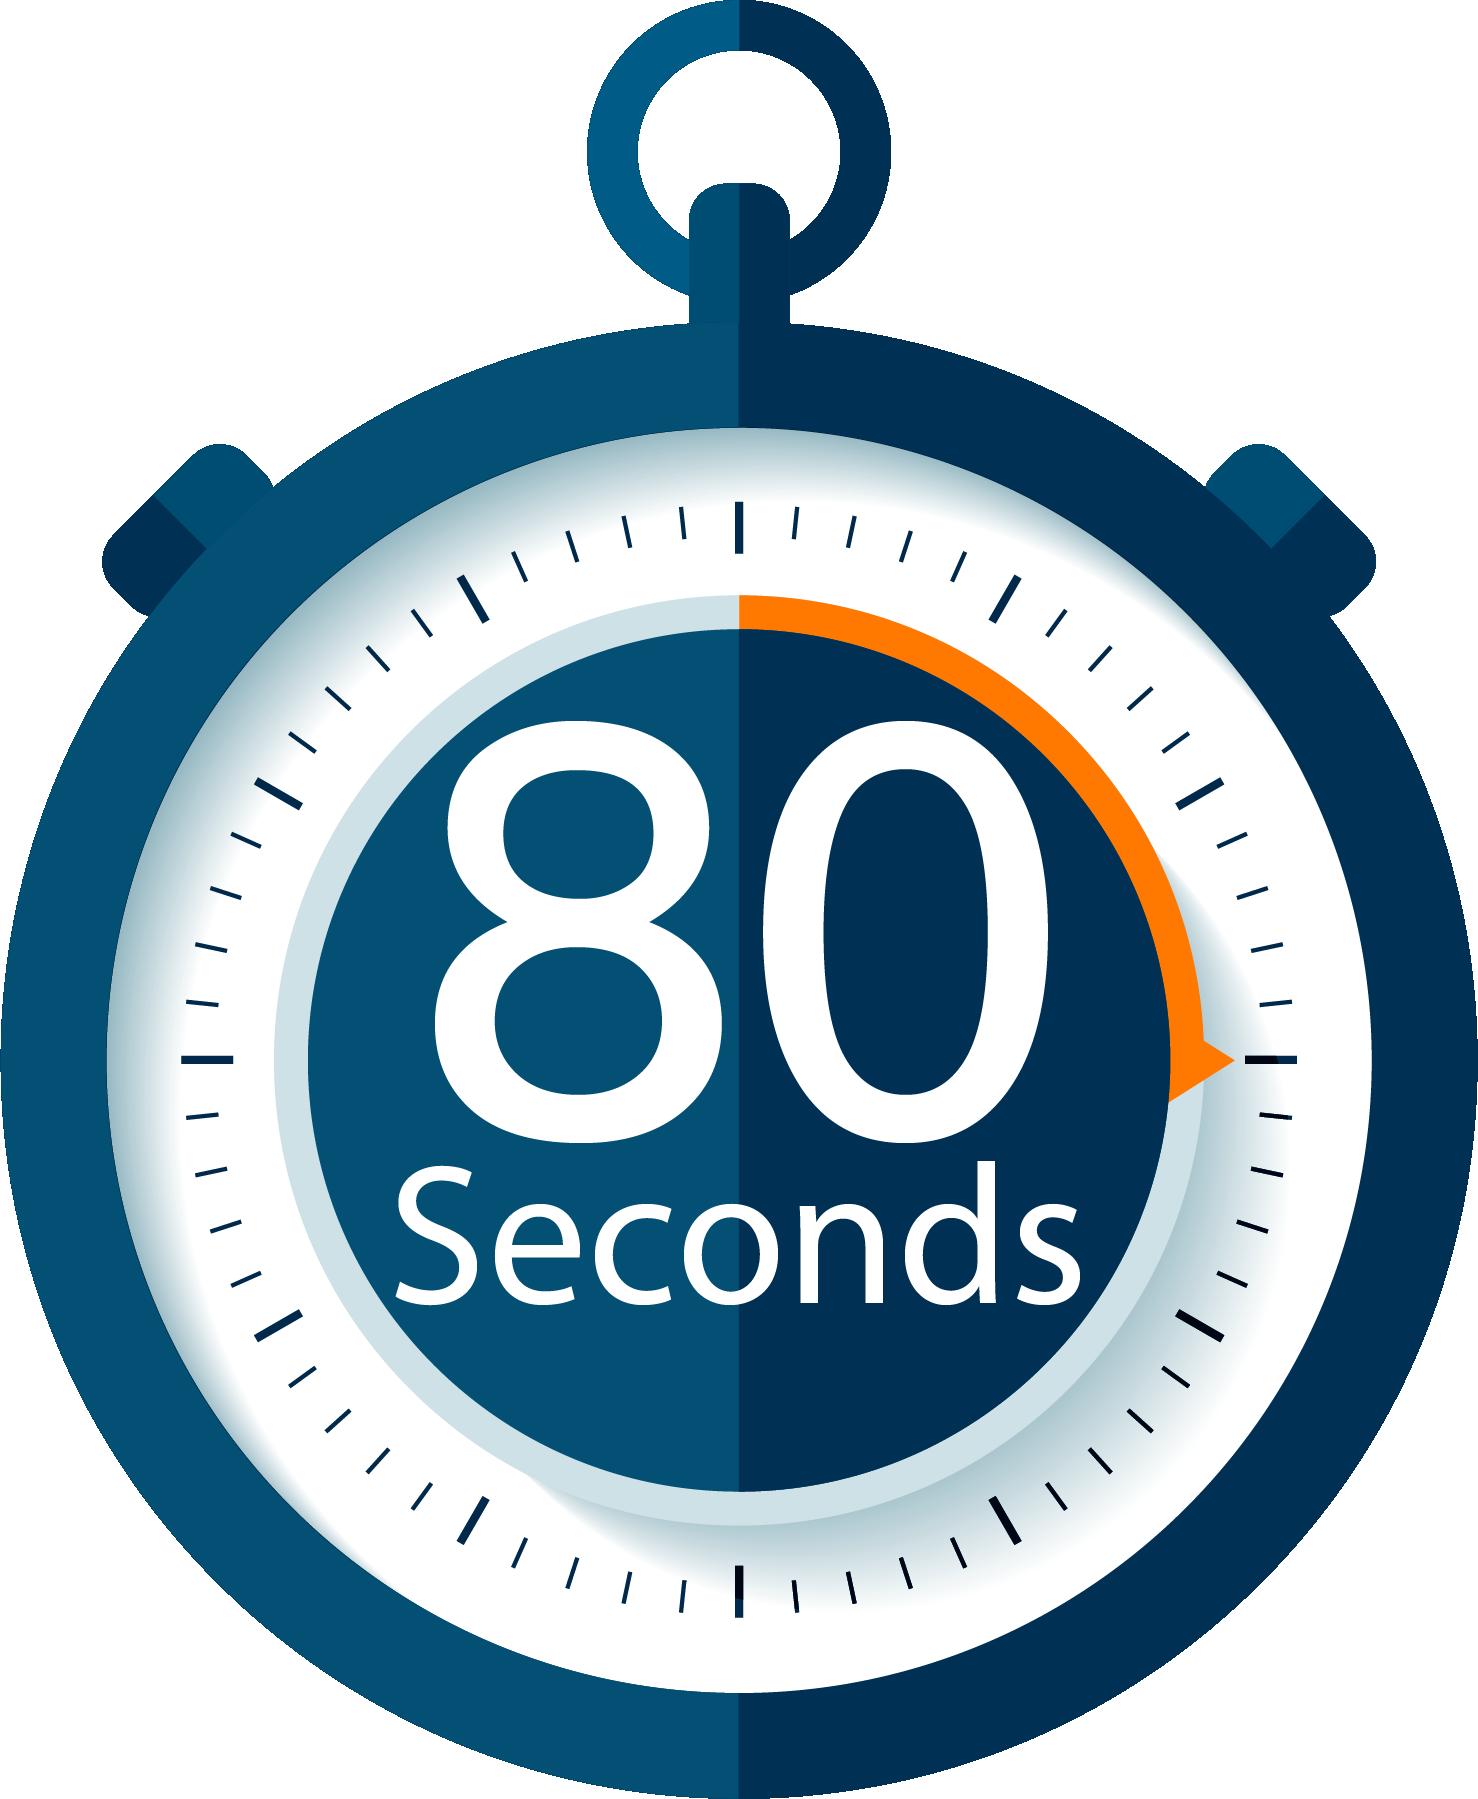 Load a YOYO body in 80 seconds